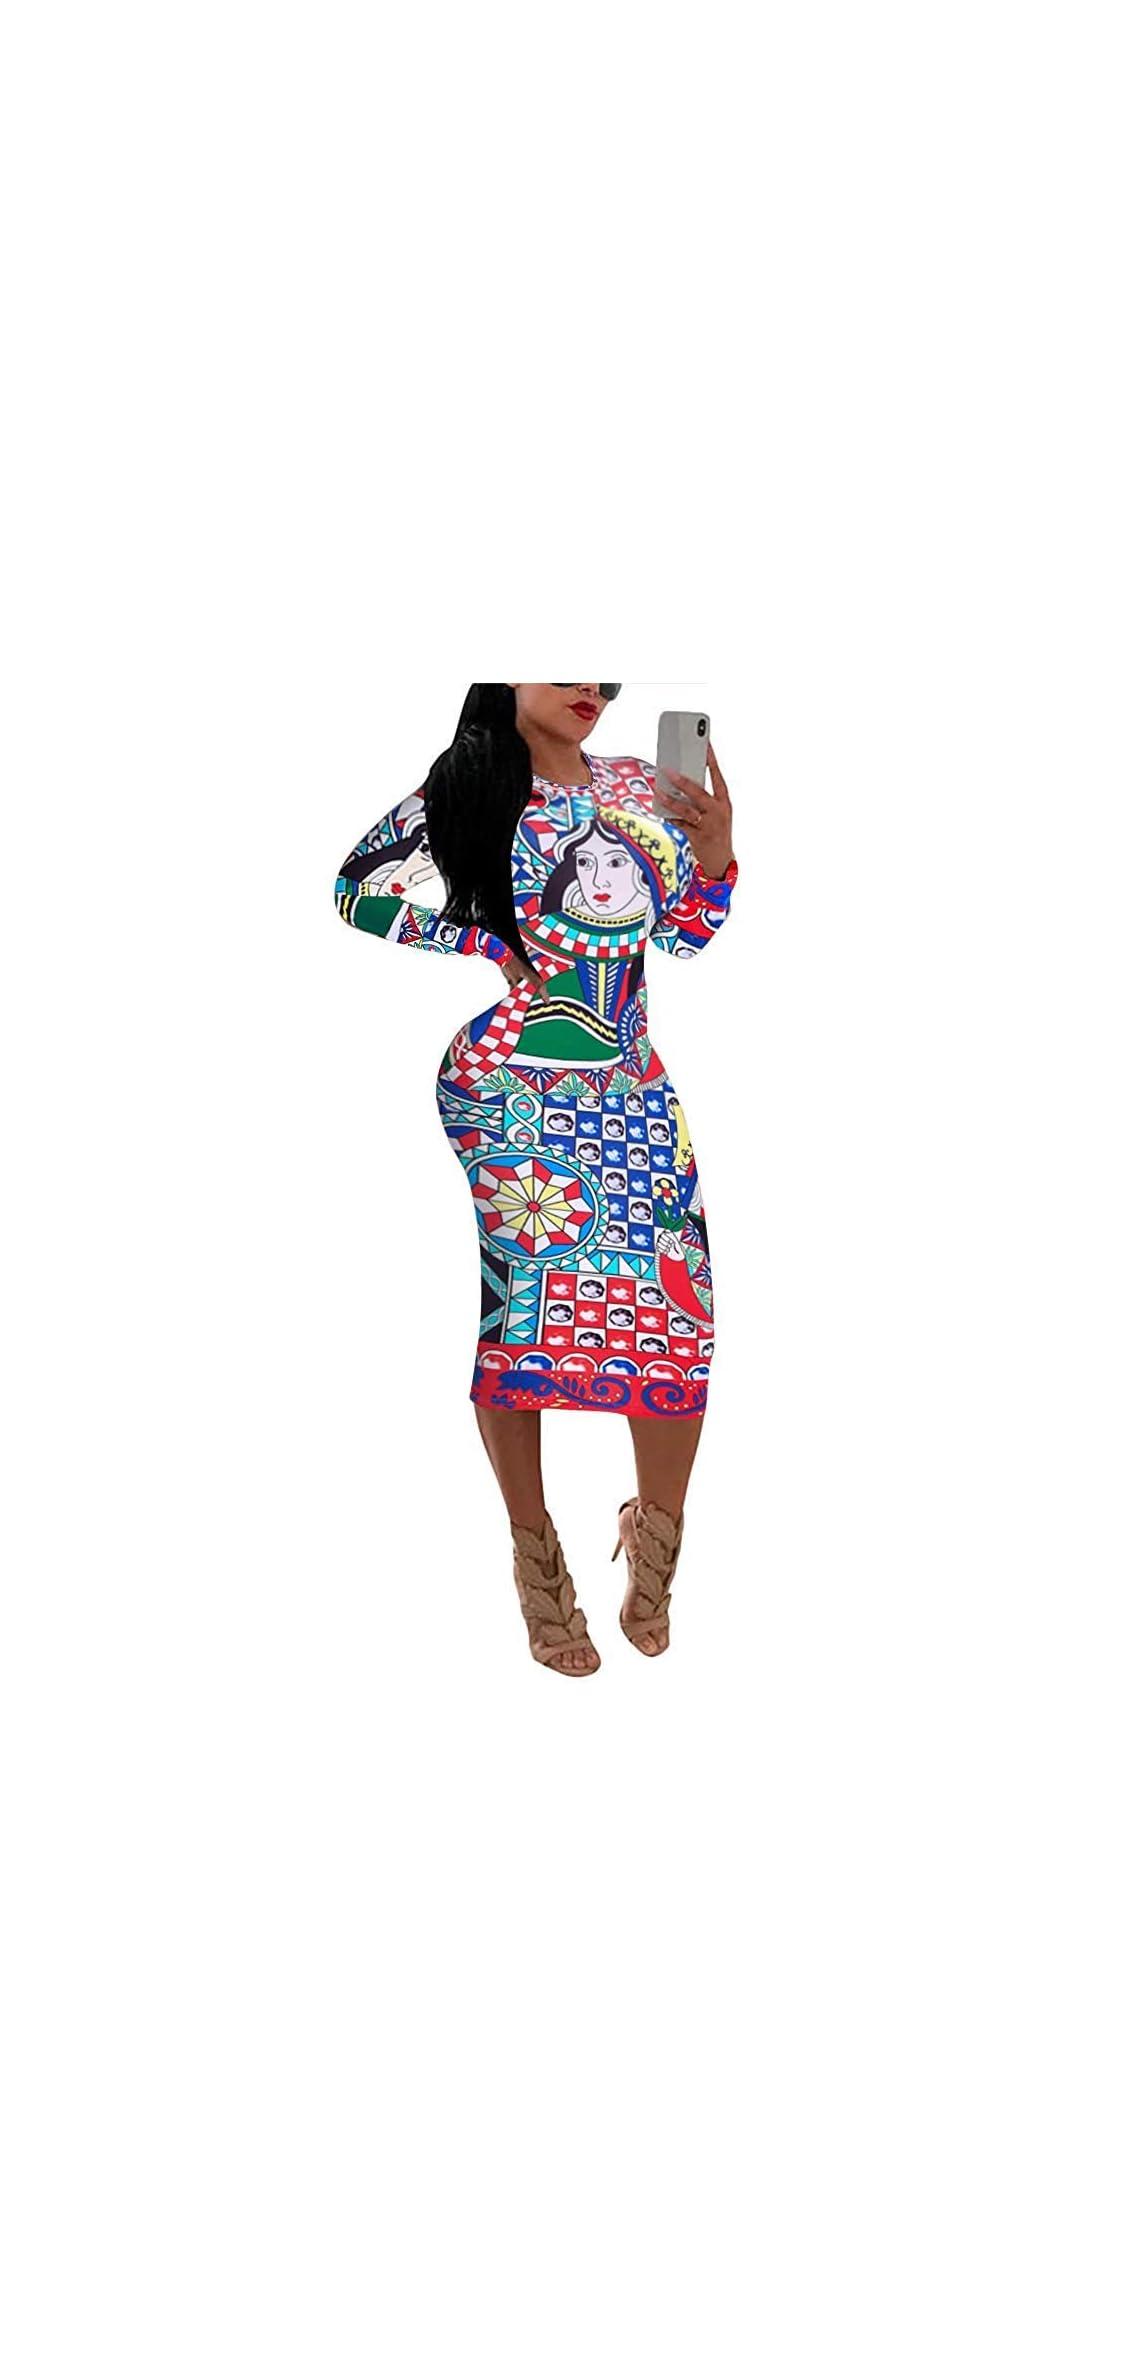 Dress For Women Elegant Long Sleeve - Stretchy African Floral